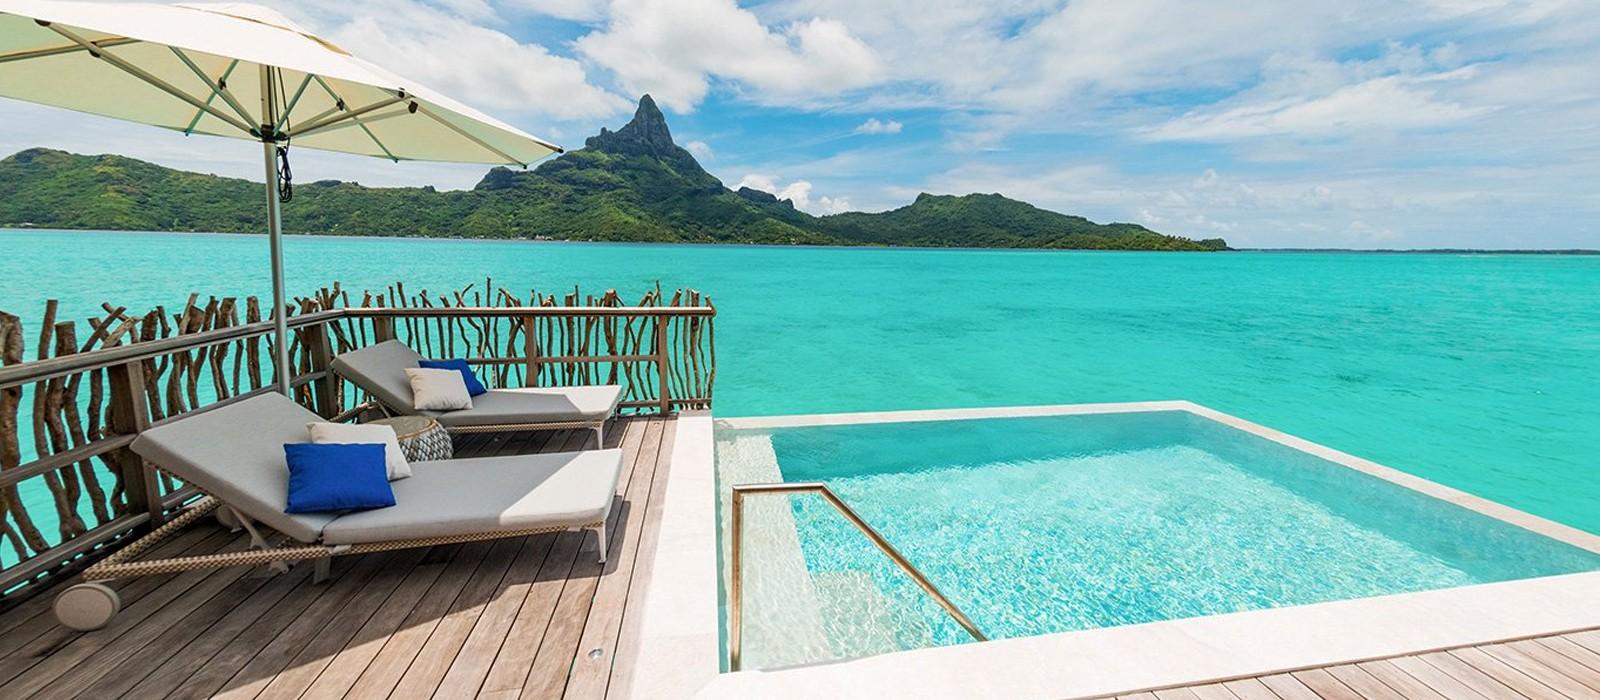 Header InterContinental Bora Bora Resort And Thalasso Spa Luxury Bora Bora Honeymoon Packages